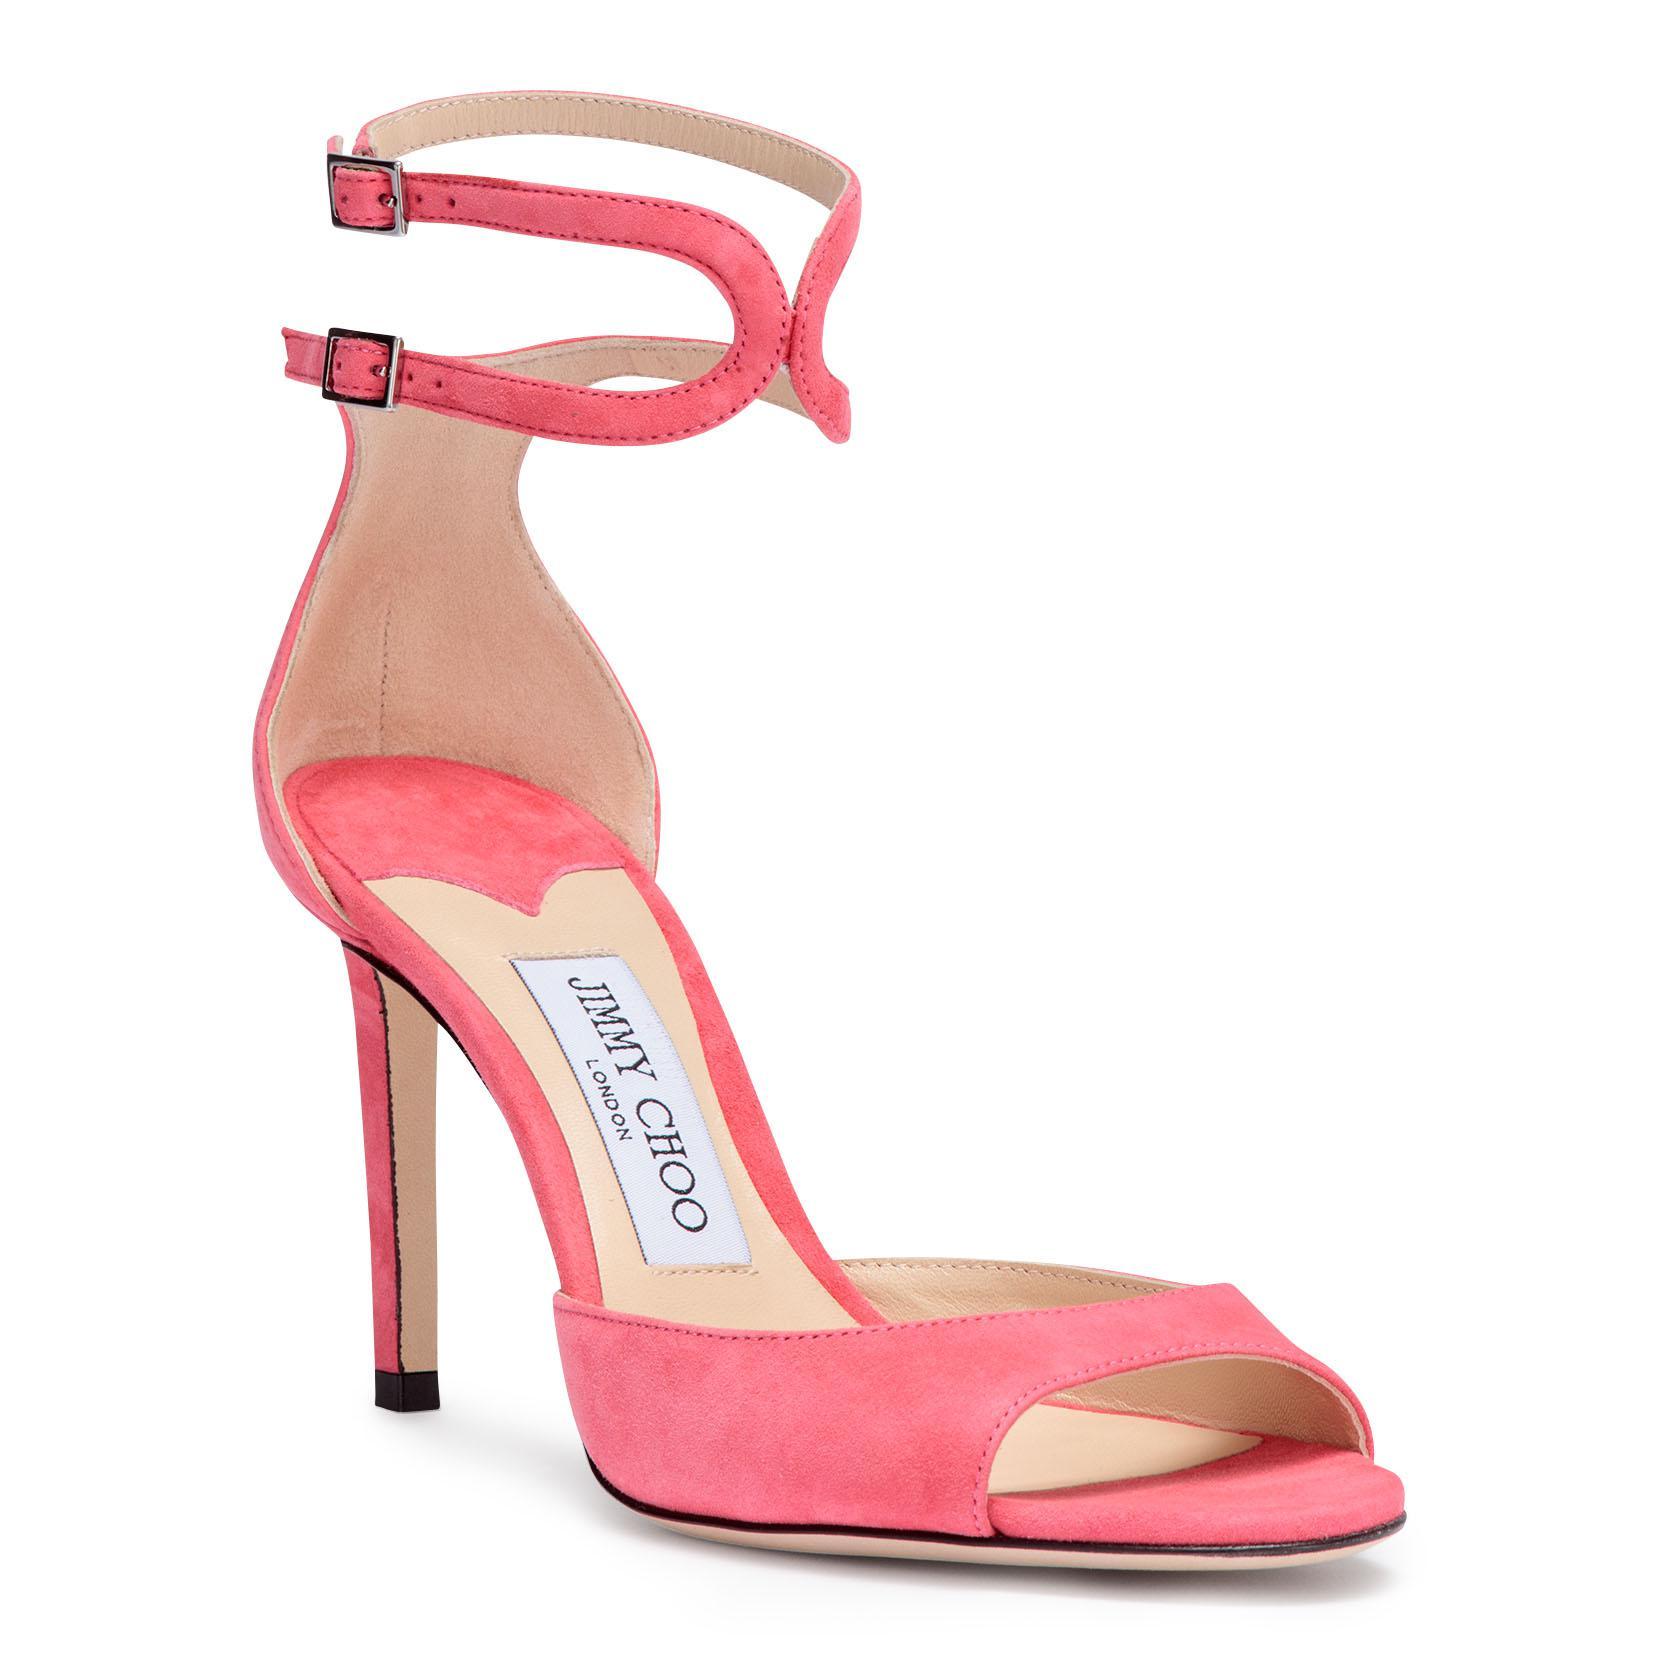 Lane sandals - Pink & Purple Jimmy Choo London 3dAMt80rIM